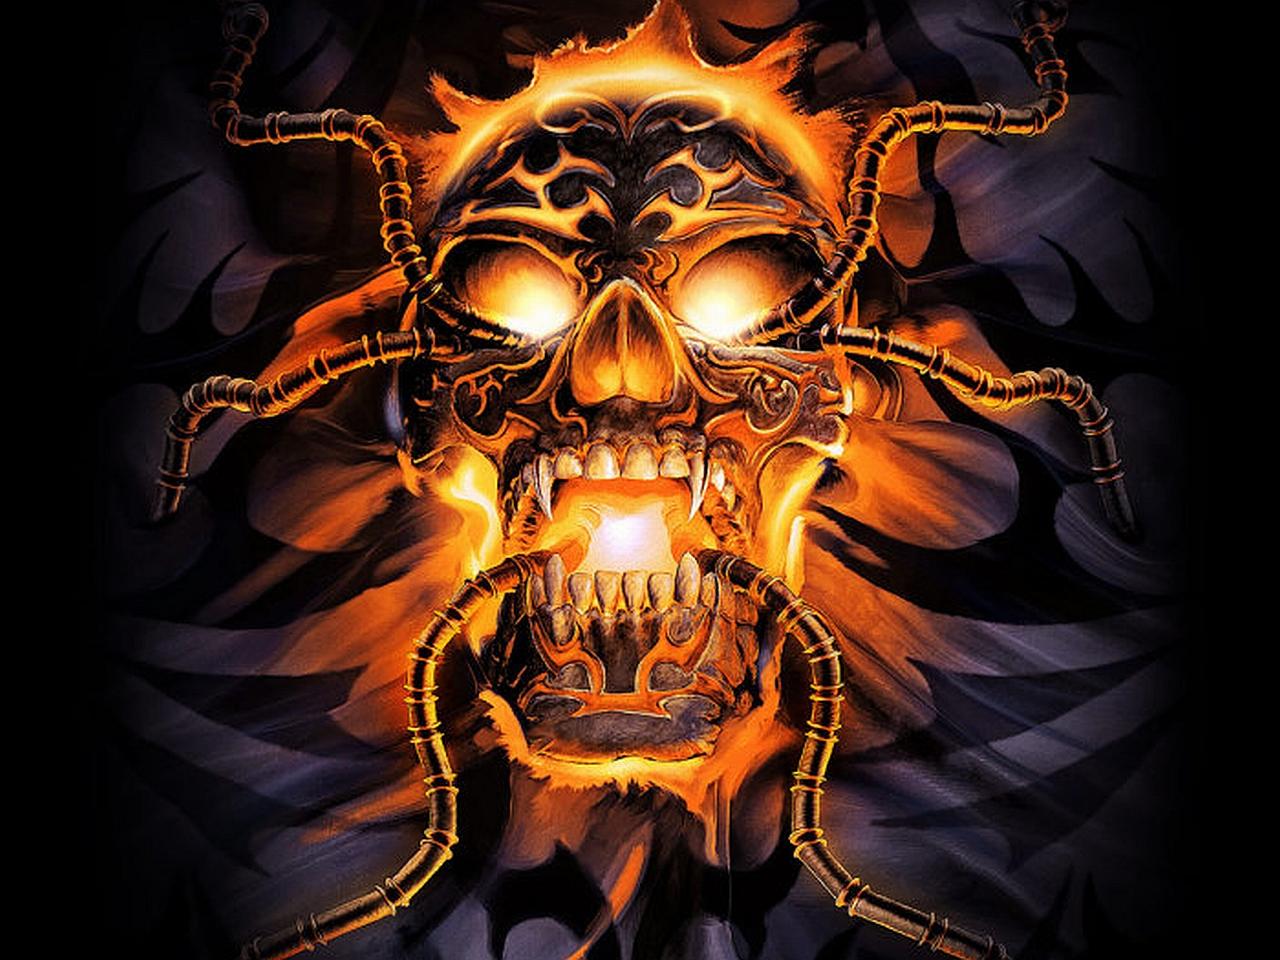 Dark skull wallpapers wallpapersafari - Scary skull backgrounds ...